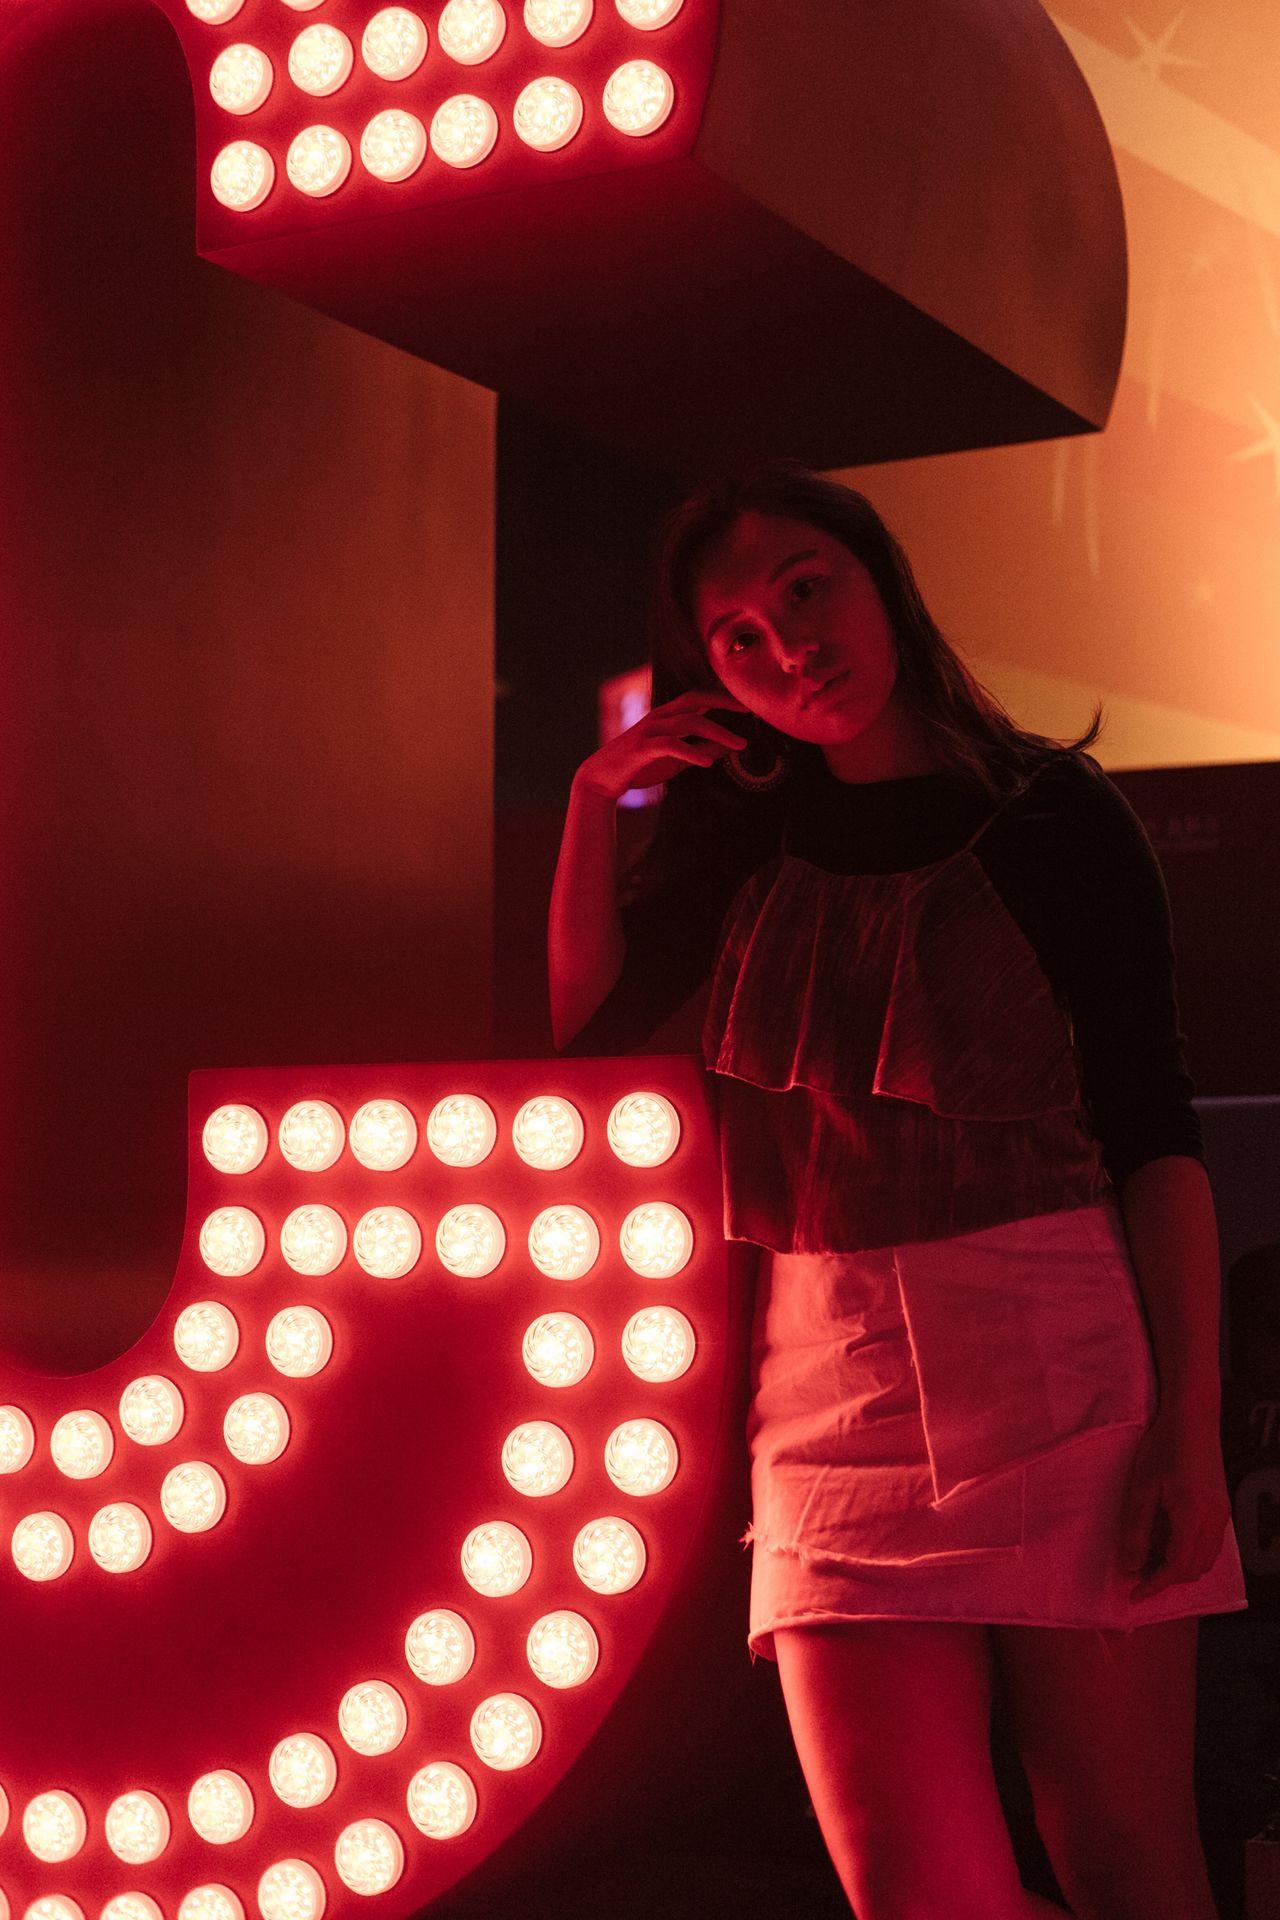 Explore Hk Lighting Equipment Lifestyles Young Women Night Portrait Of A Woman Portrait Portrait Of A Friend Fujifilm_xseries FUJIFILM X-T1 Fujifilm